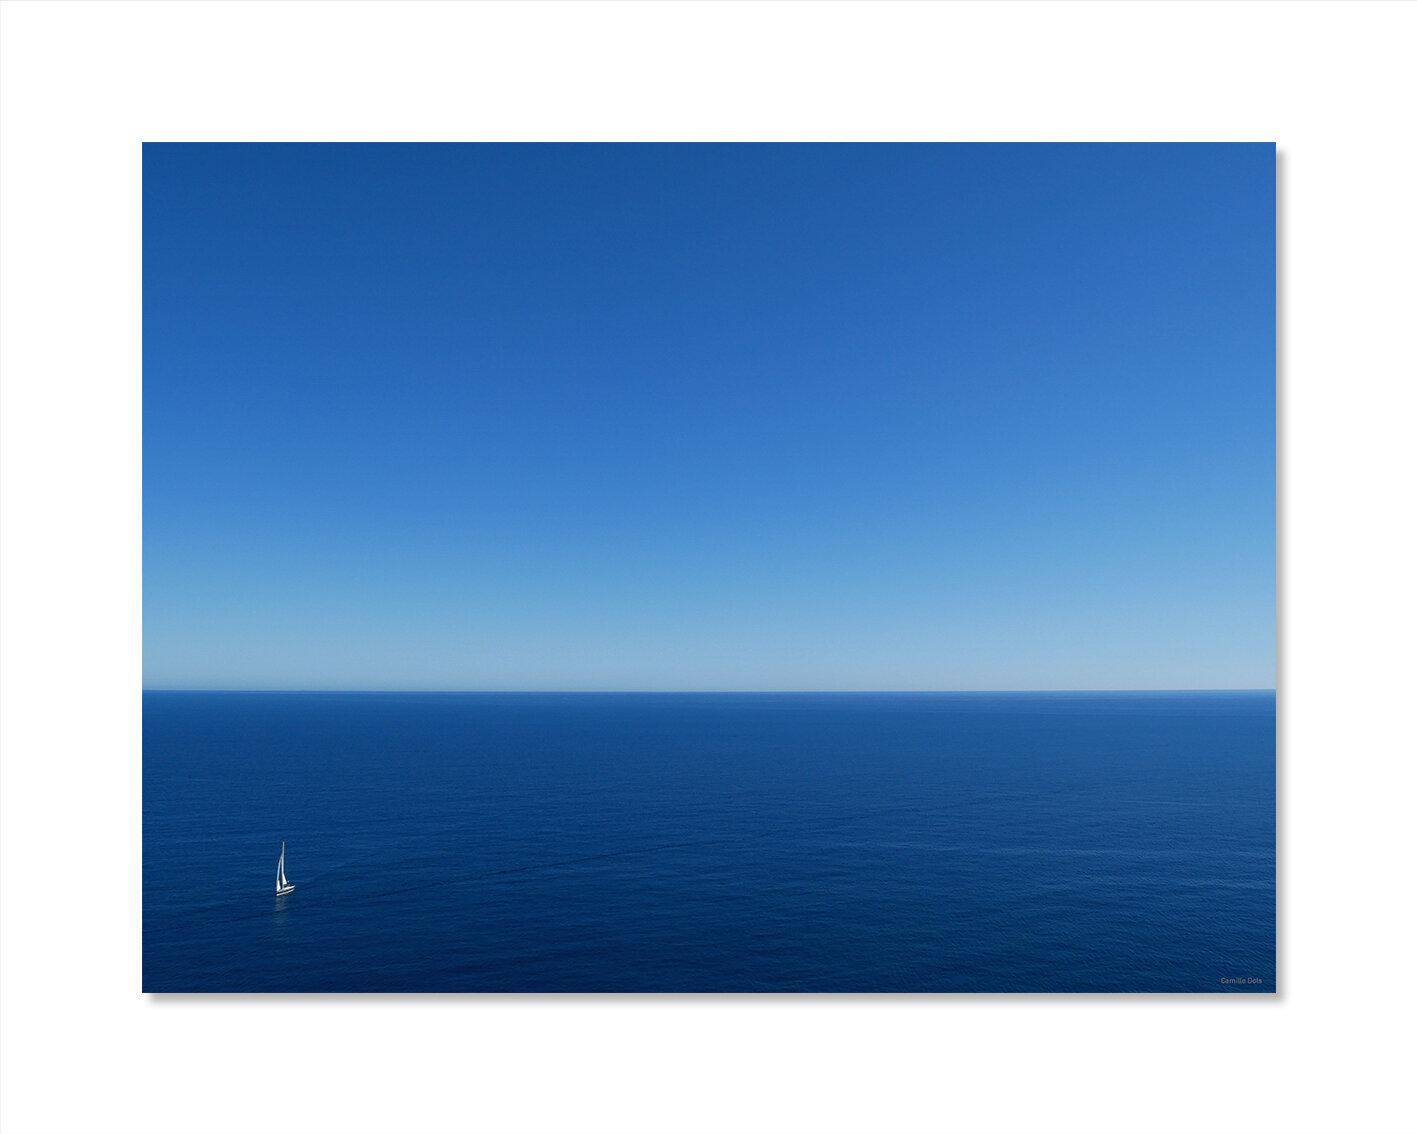 Altea - Espagne - ©Camille Dols